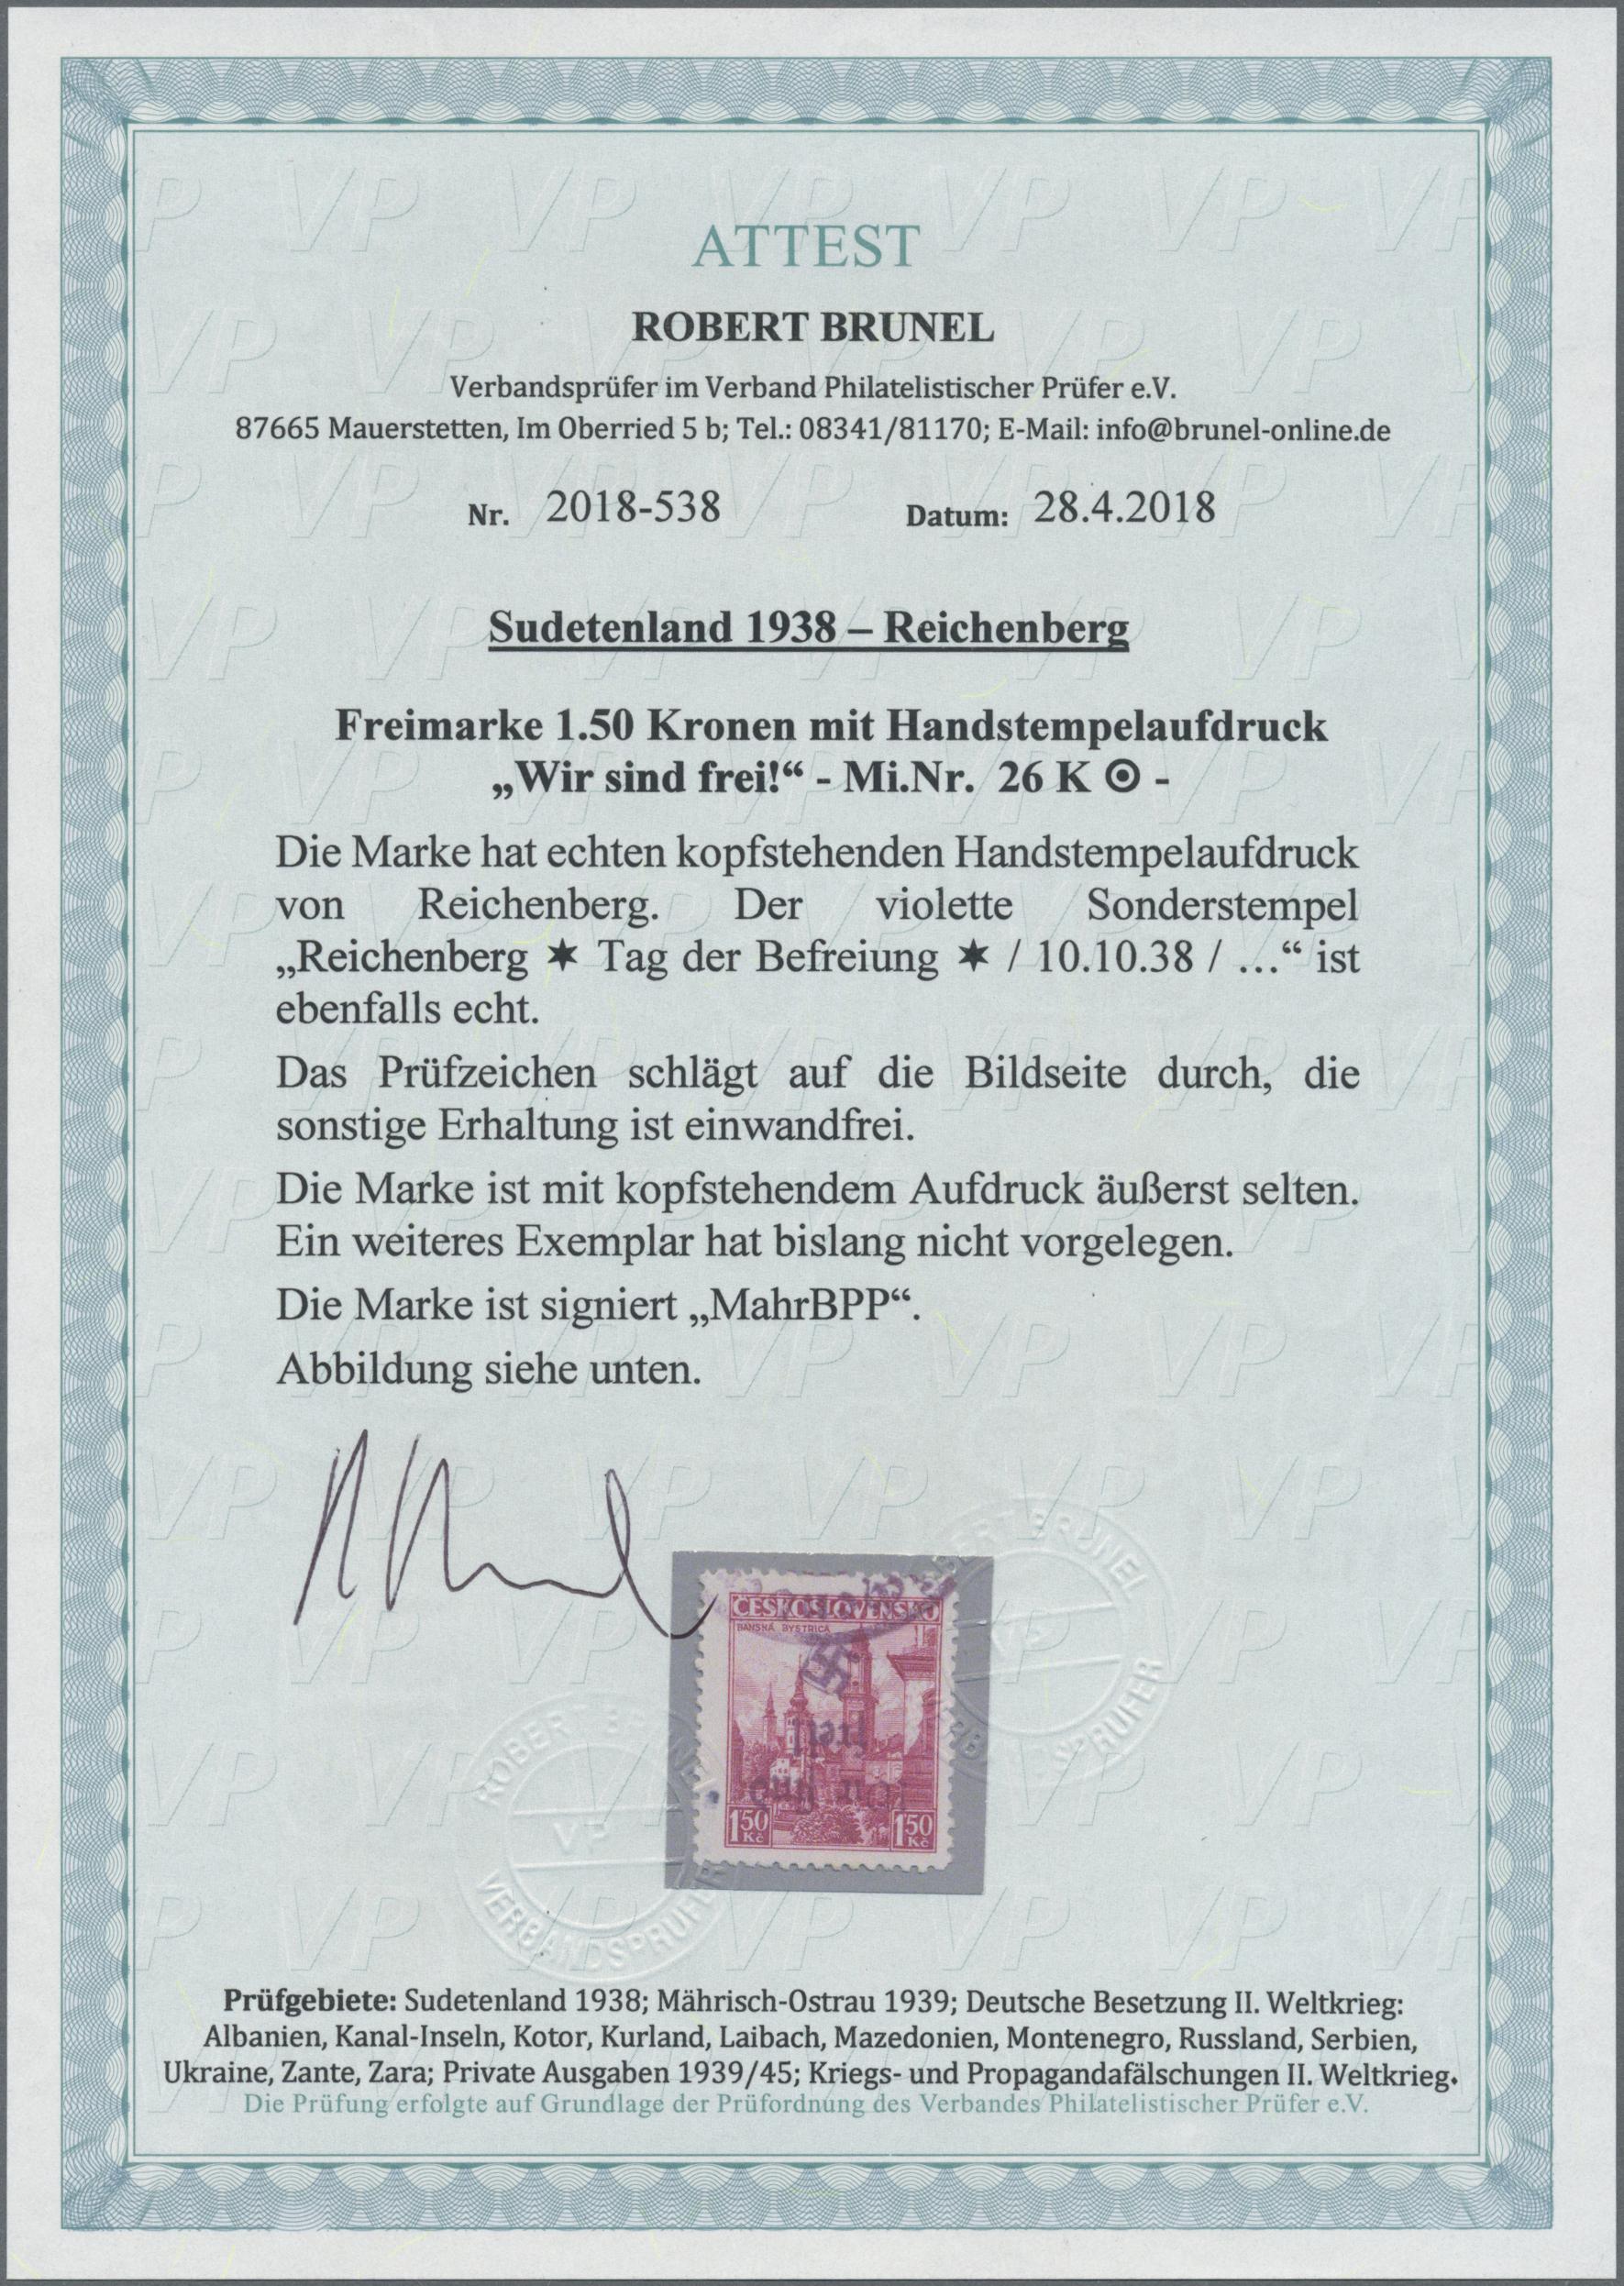 Lot 147 - Sudetenland - Reichenberg  -  Auktionshaus Christoph Gärtner GmbH & Co. KG Auction #41 Special auction part one